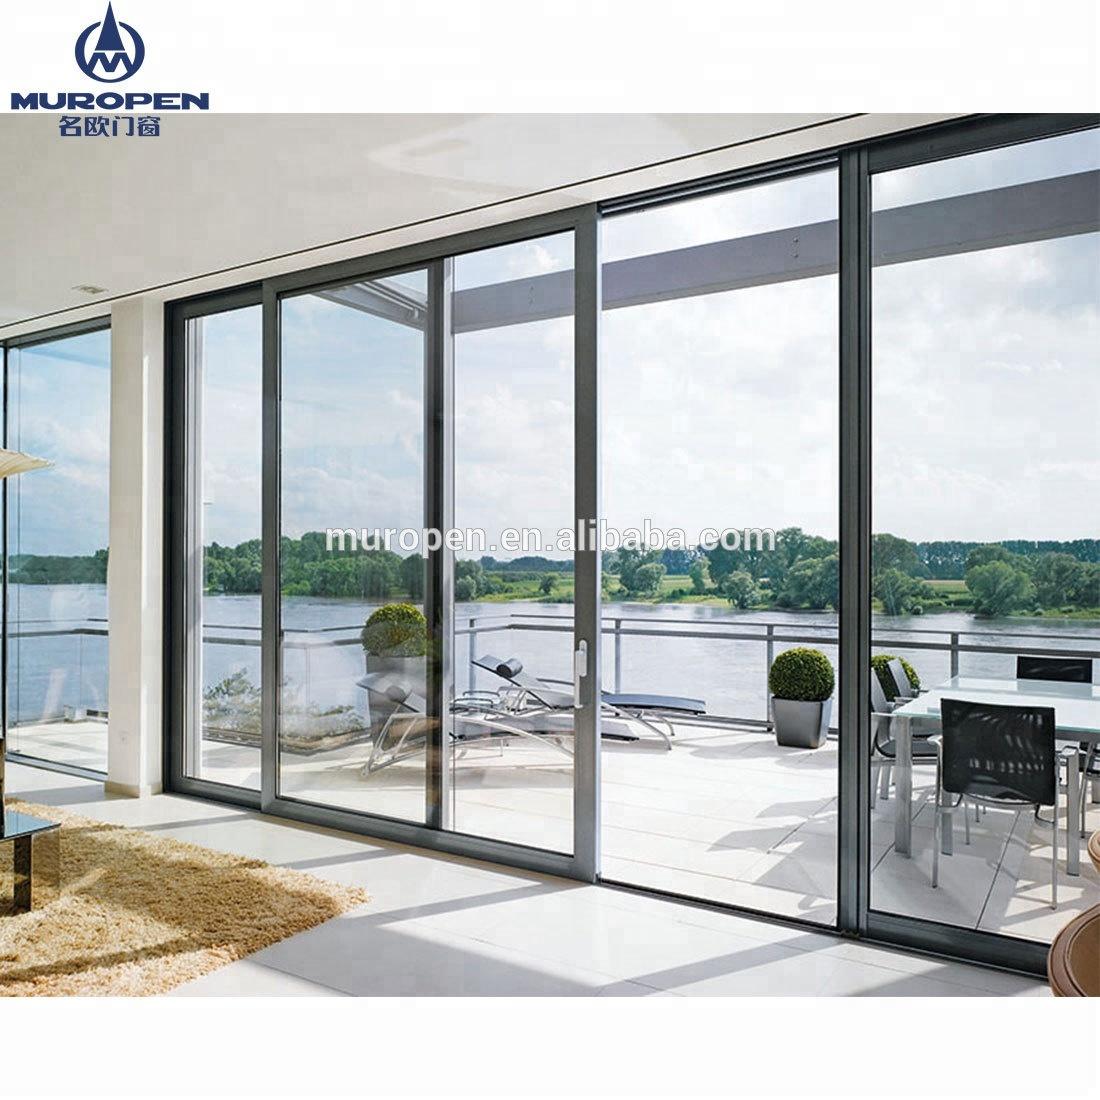 Aluminium Sliding Glass Door Philippines Price And Designswindow